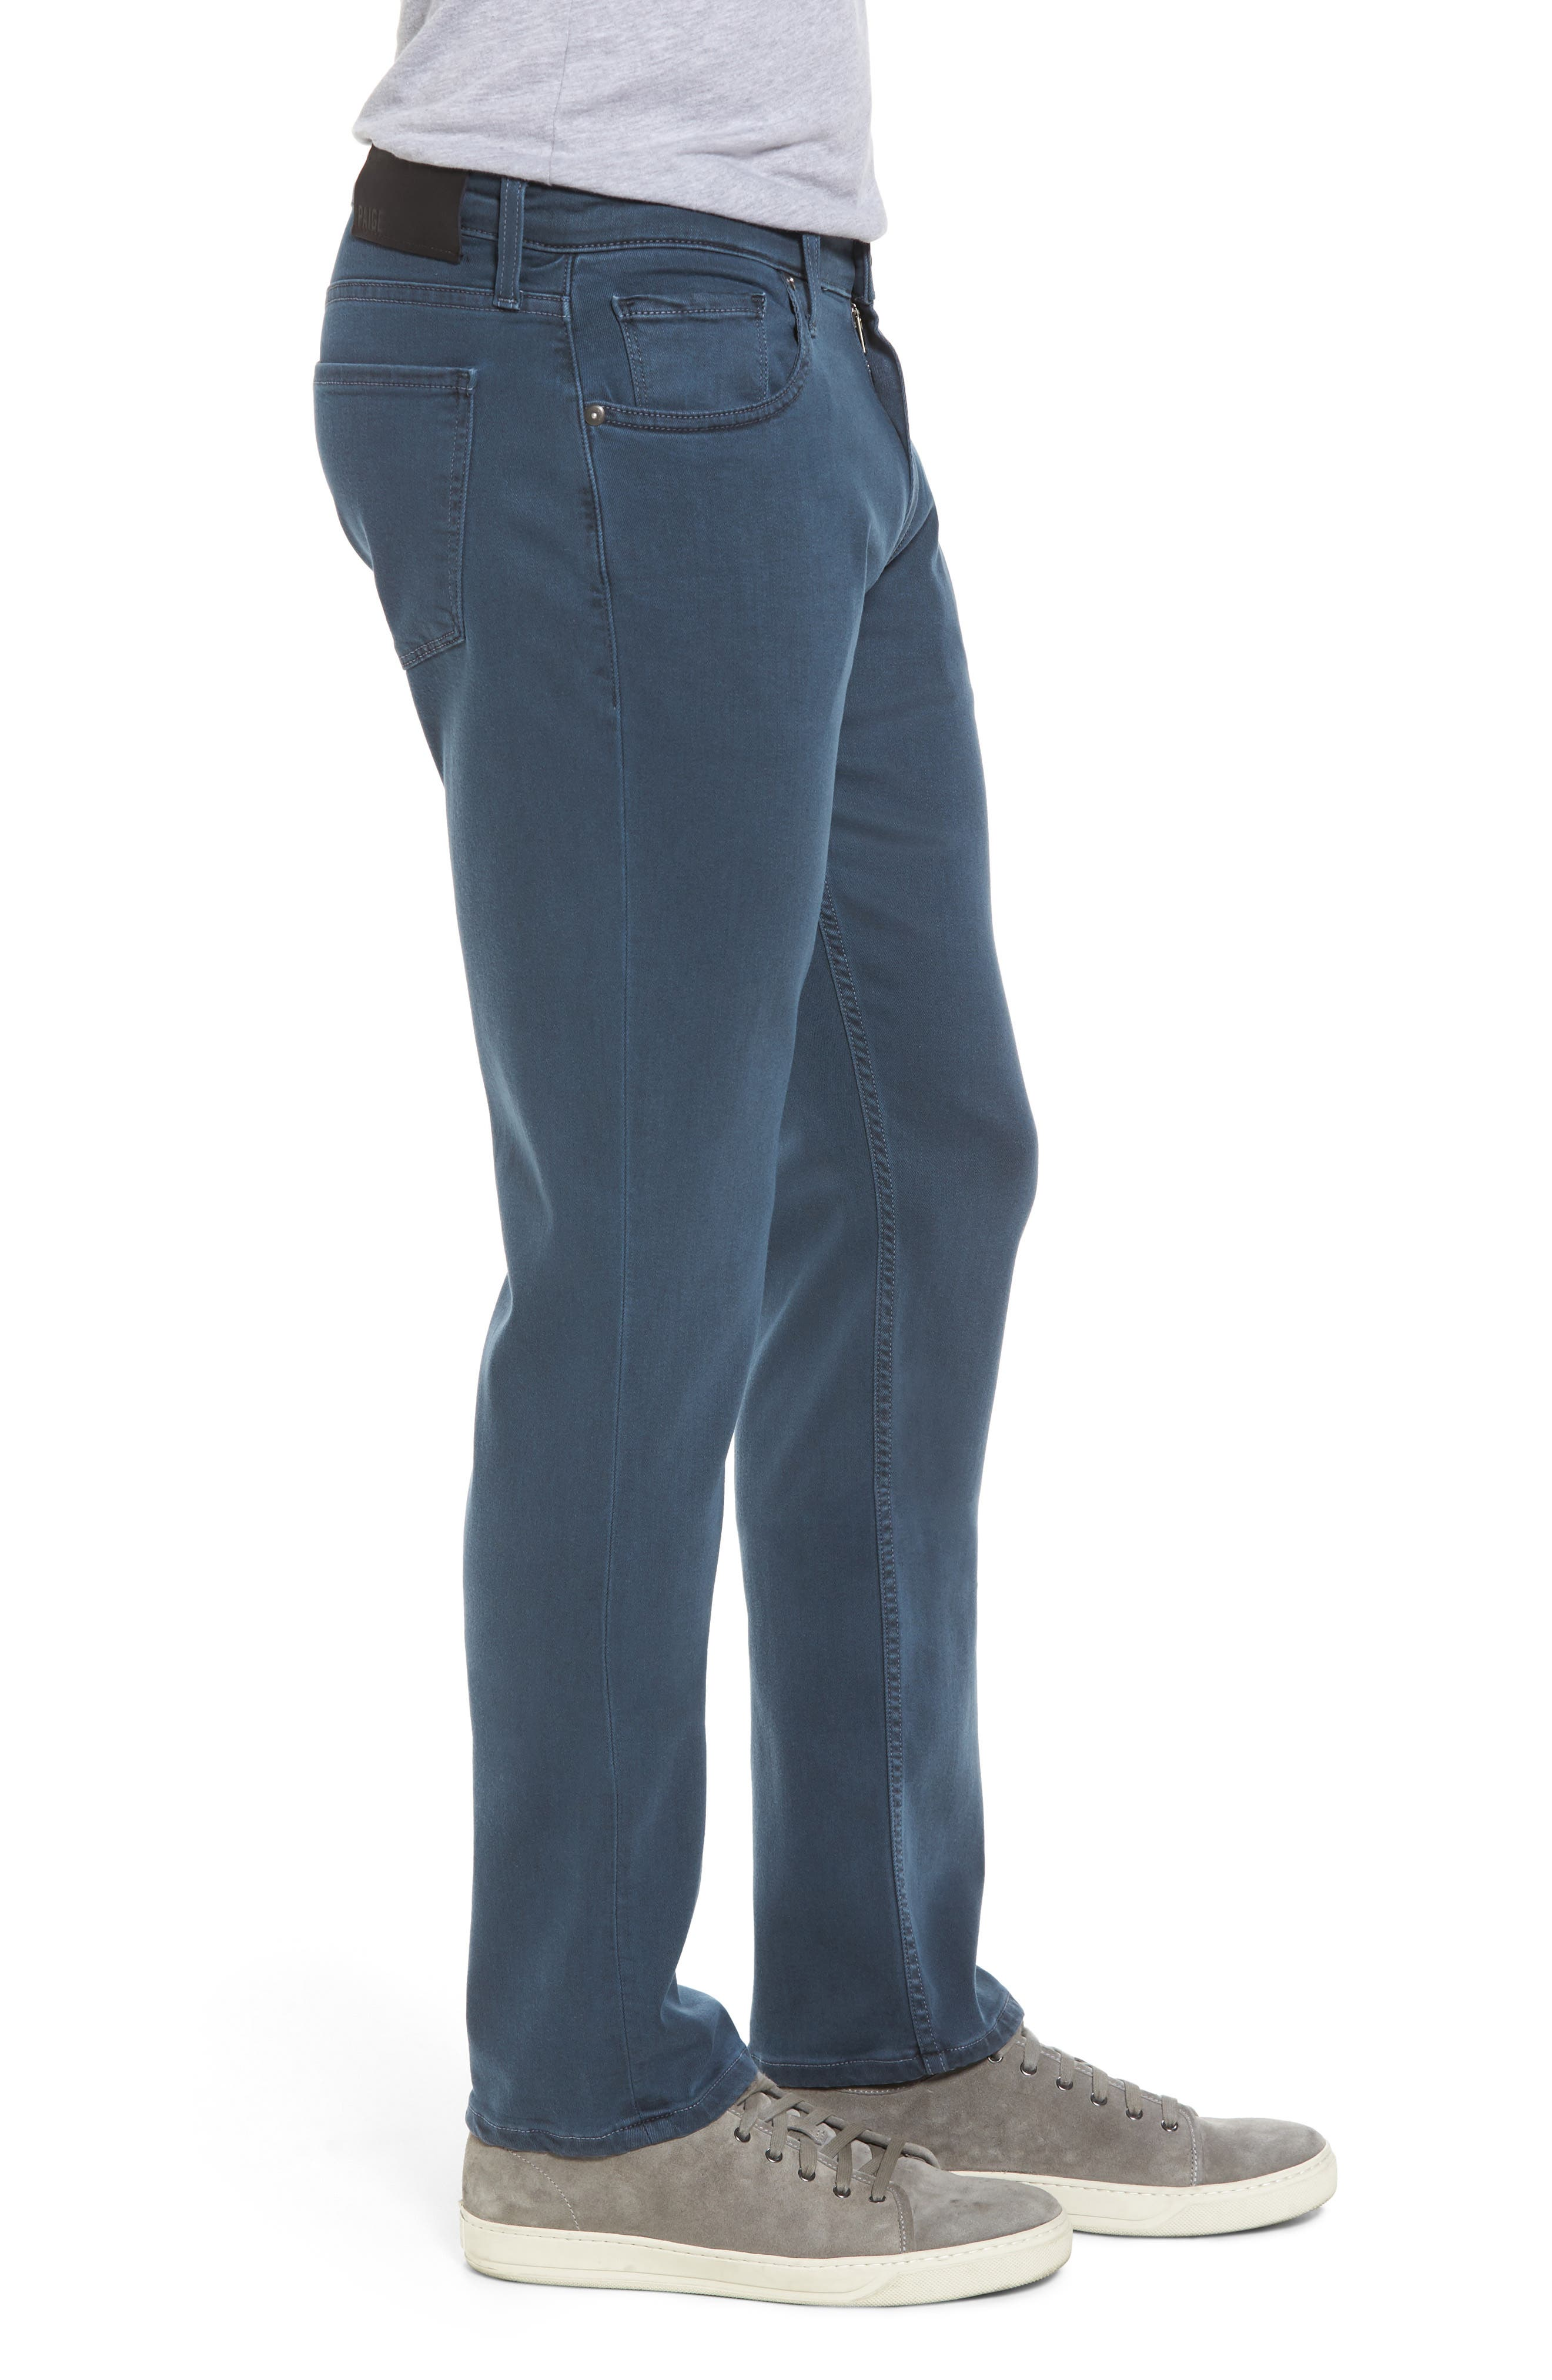 Transcend - Federal Slim Straight Fit Jeans,                             Alternate thumbnail 3, color,                             VINTAGE AMALFI